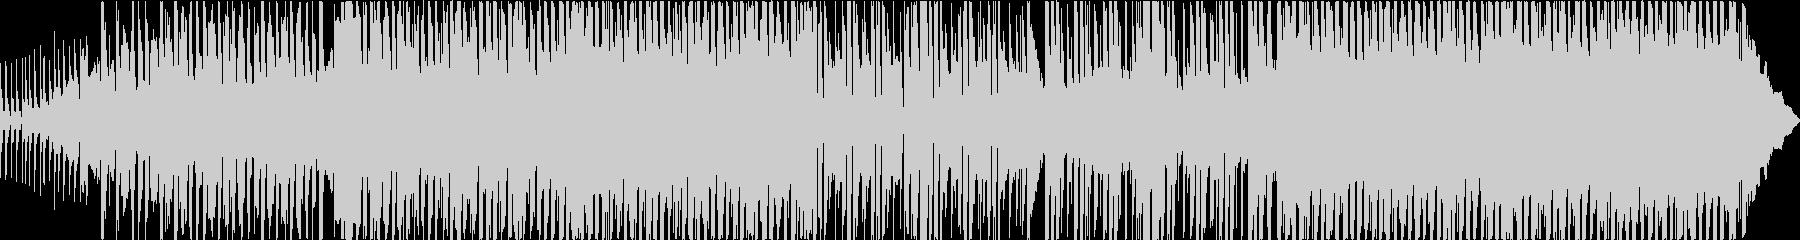 EDM inst。旋律的なシンセメ...の未再生の波形